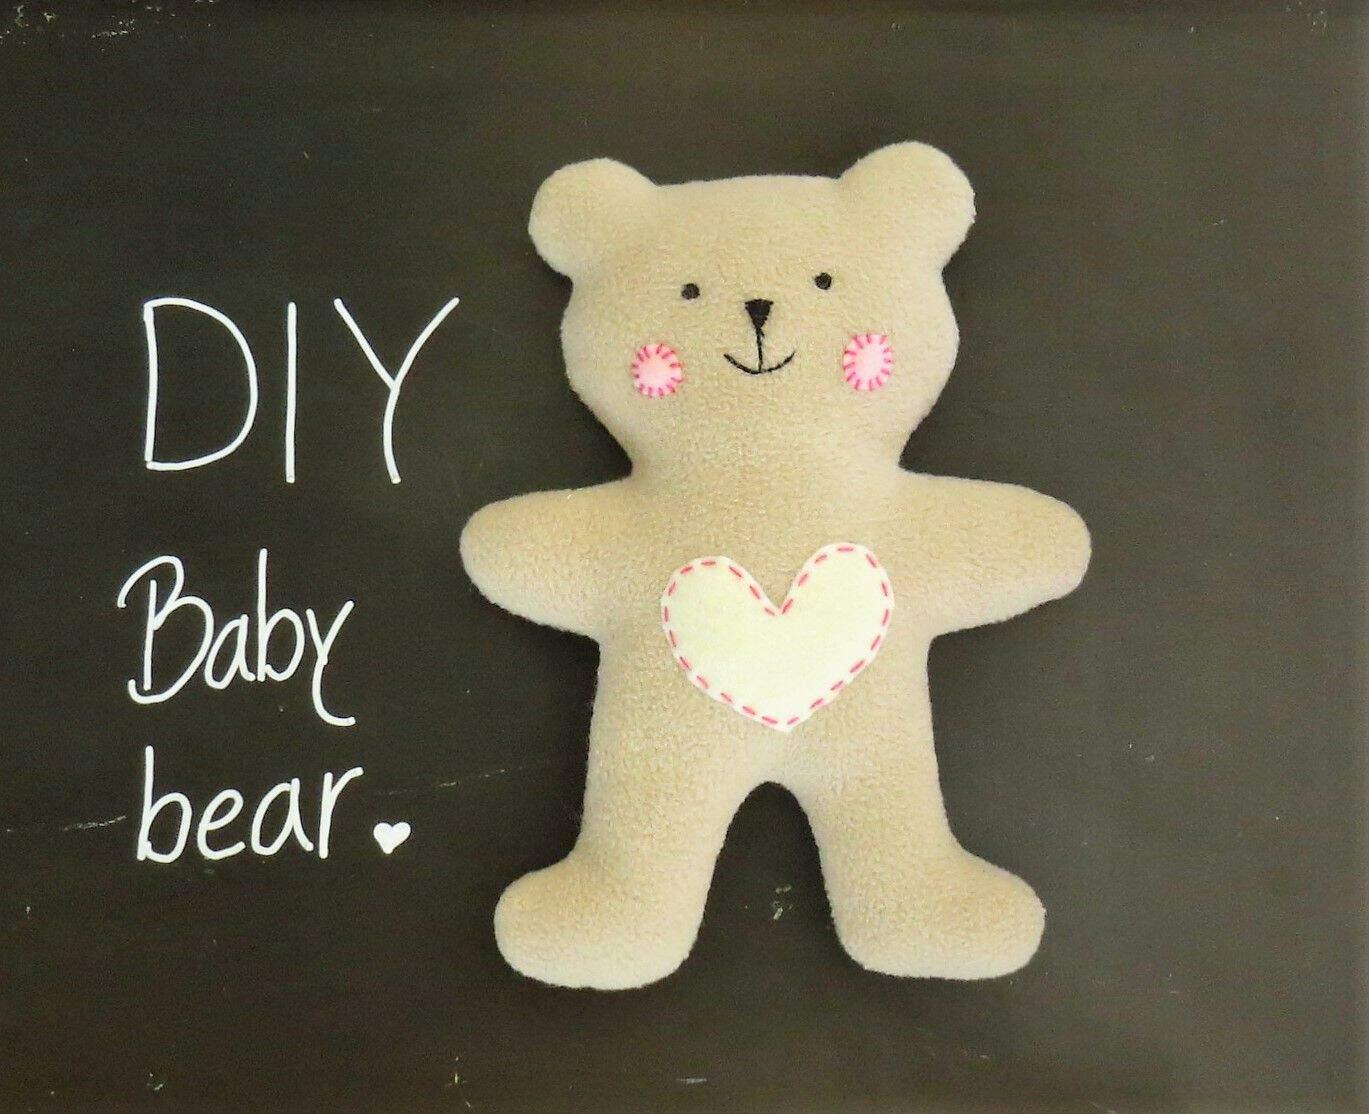 Flat baby bear